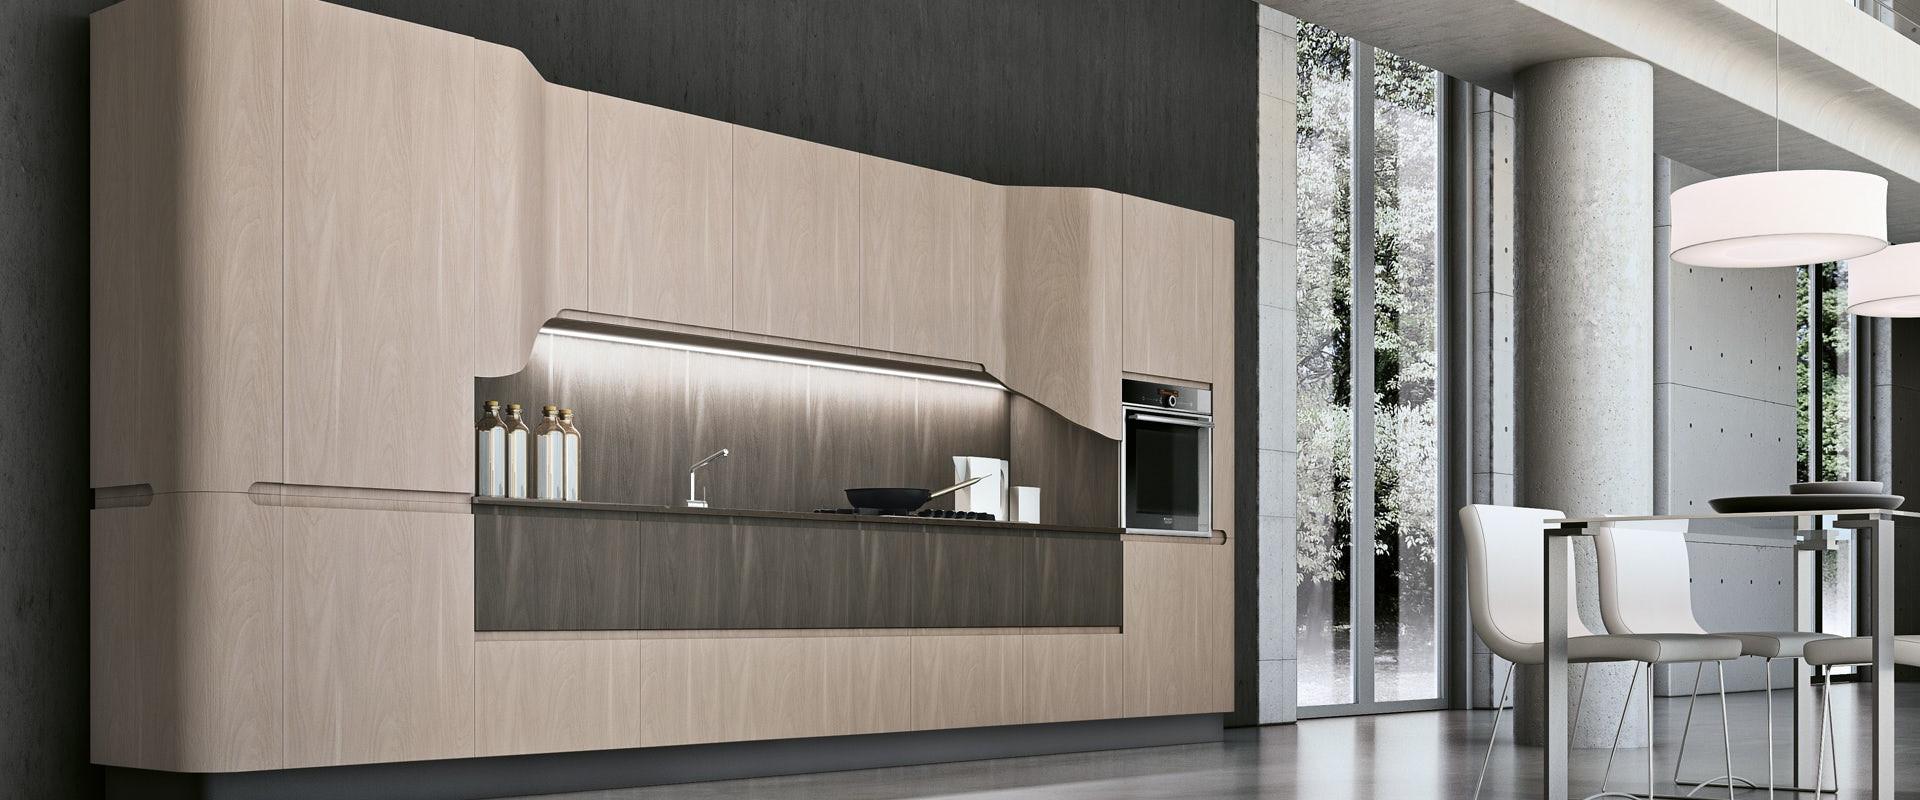 stosa-cucine-moderne-bring-85.jpg